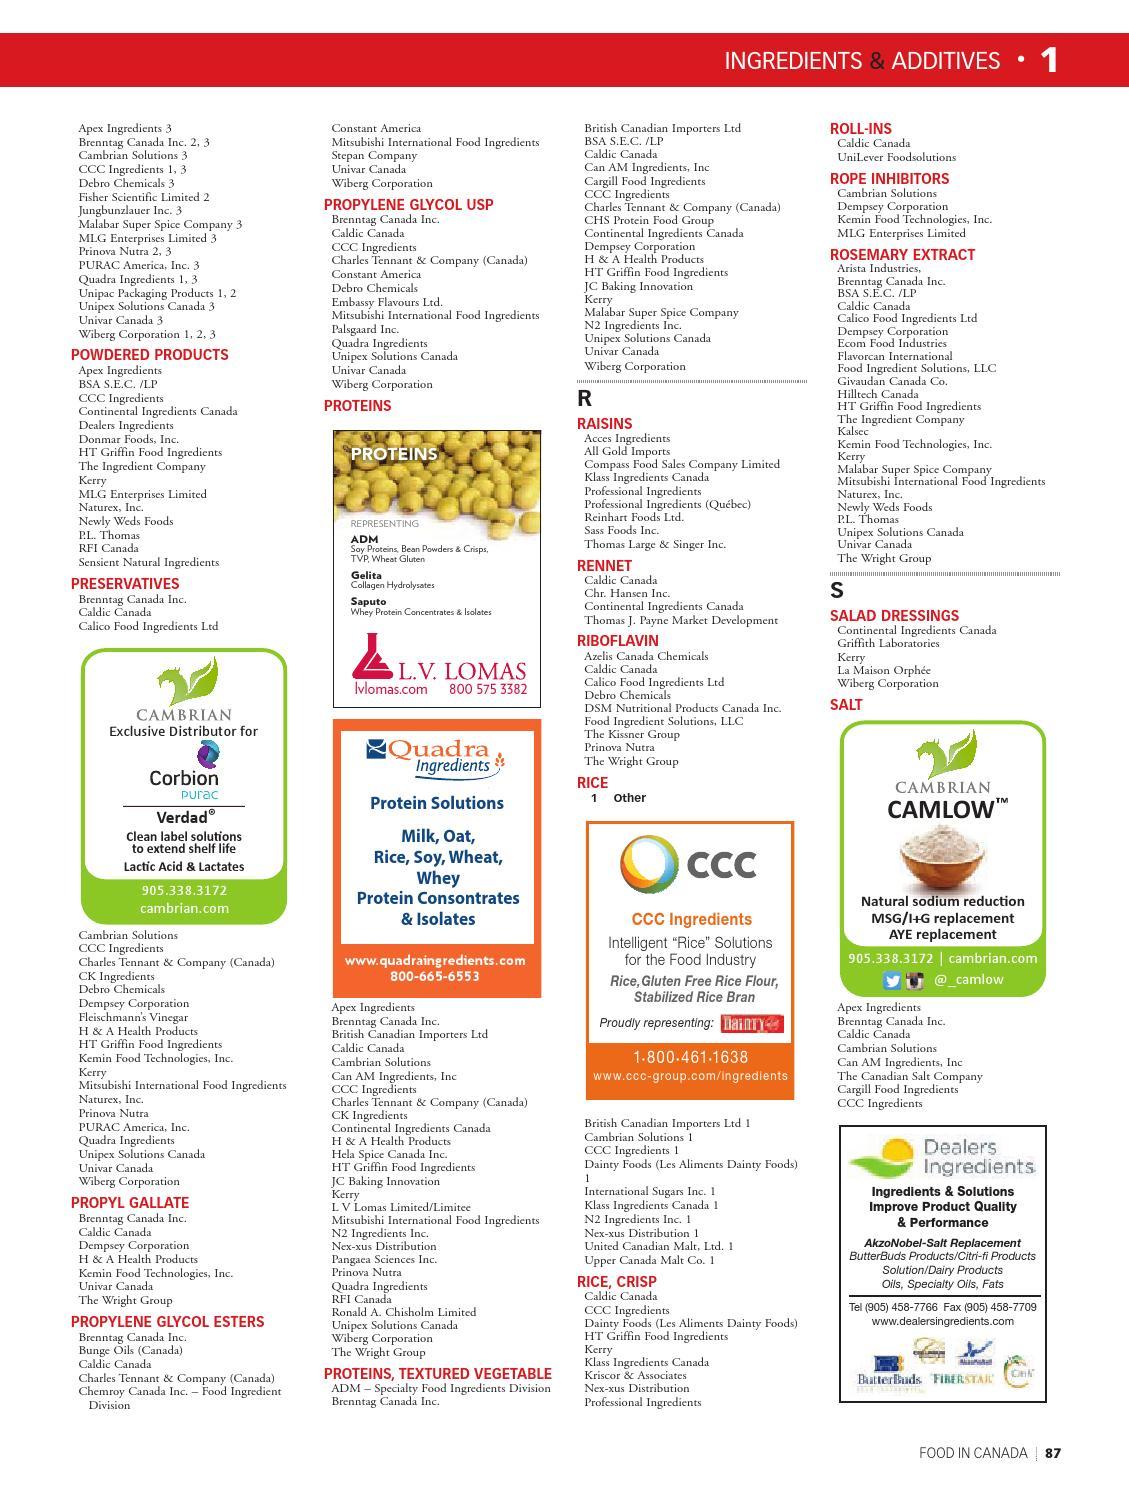 2014 10 1 by Farm Business Communications - issuu